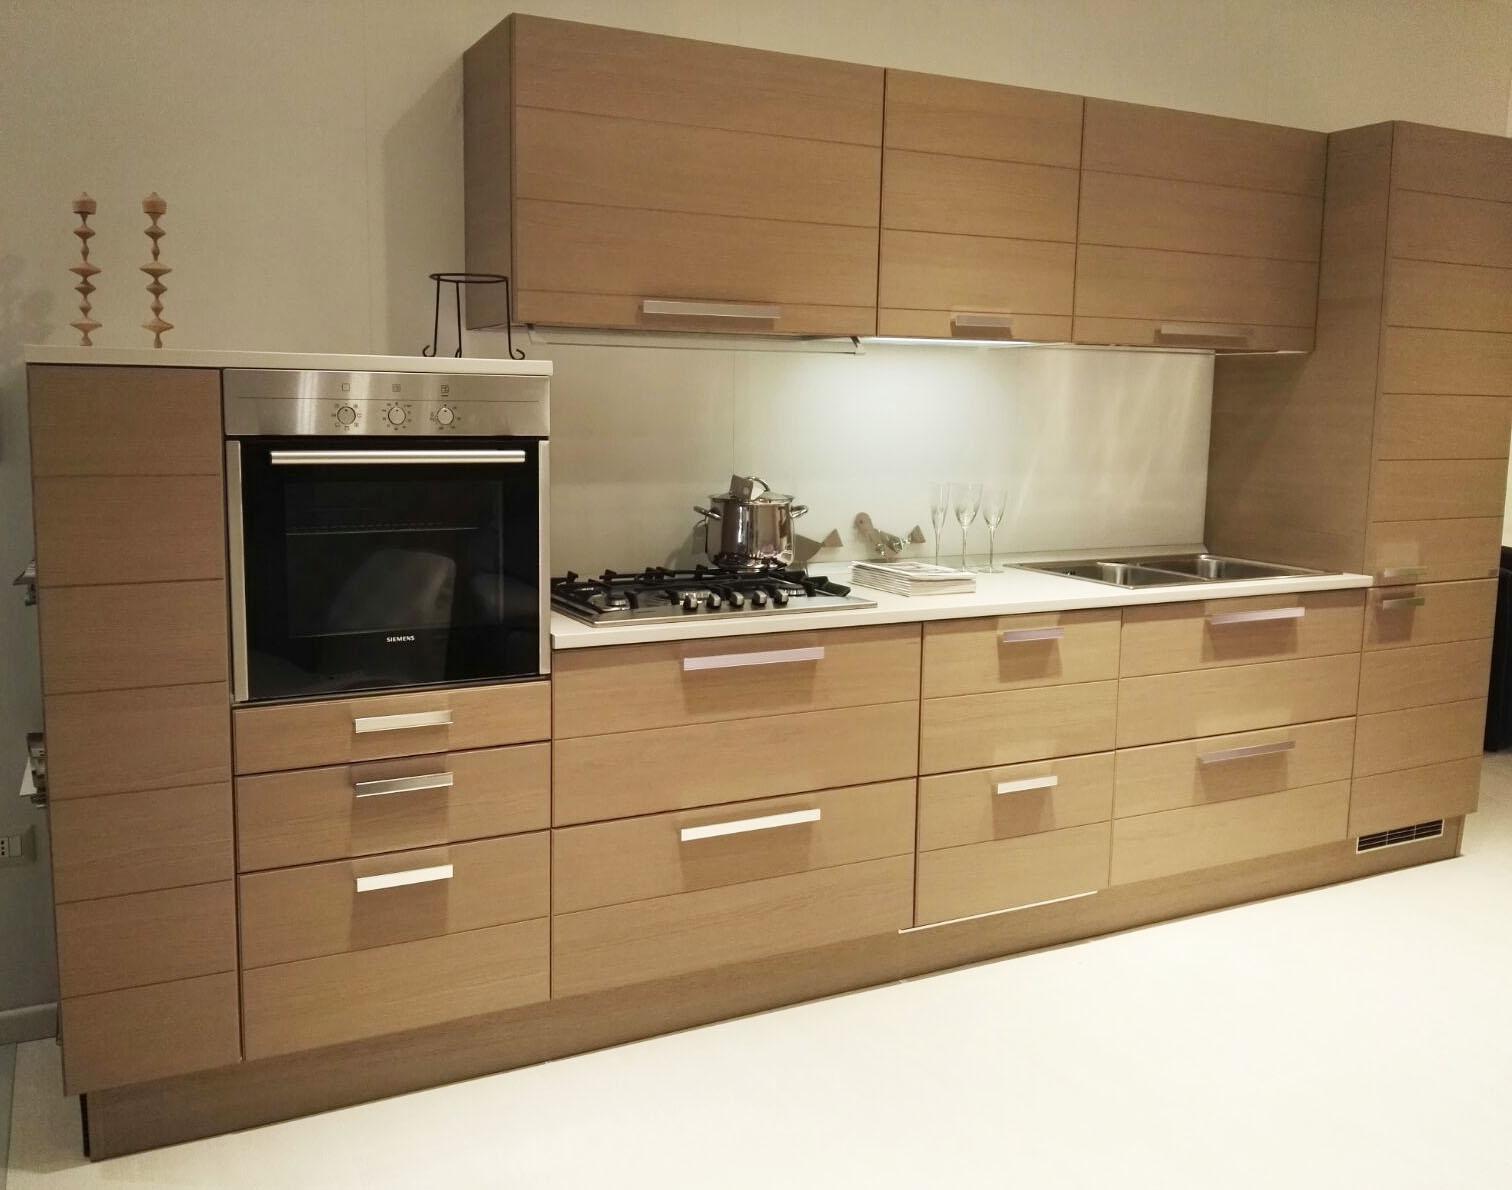 Cucina scavolini open moderna legno cucine a prezzi scontati - Barra portautensili cucina scavolini ...